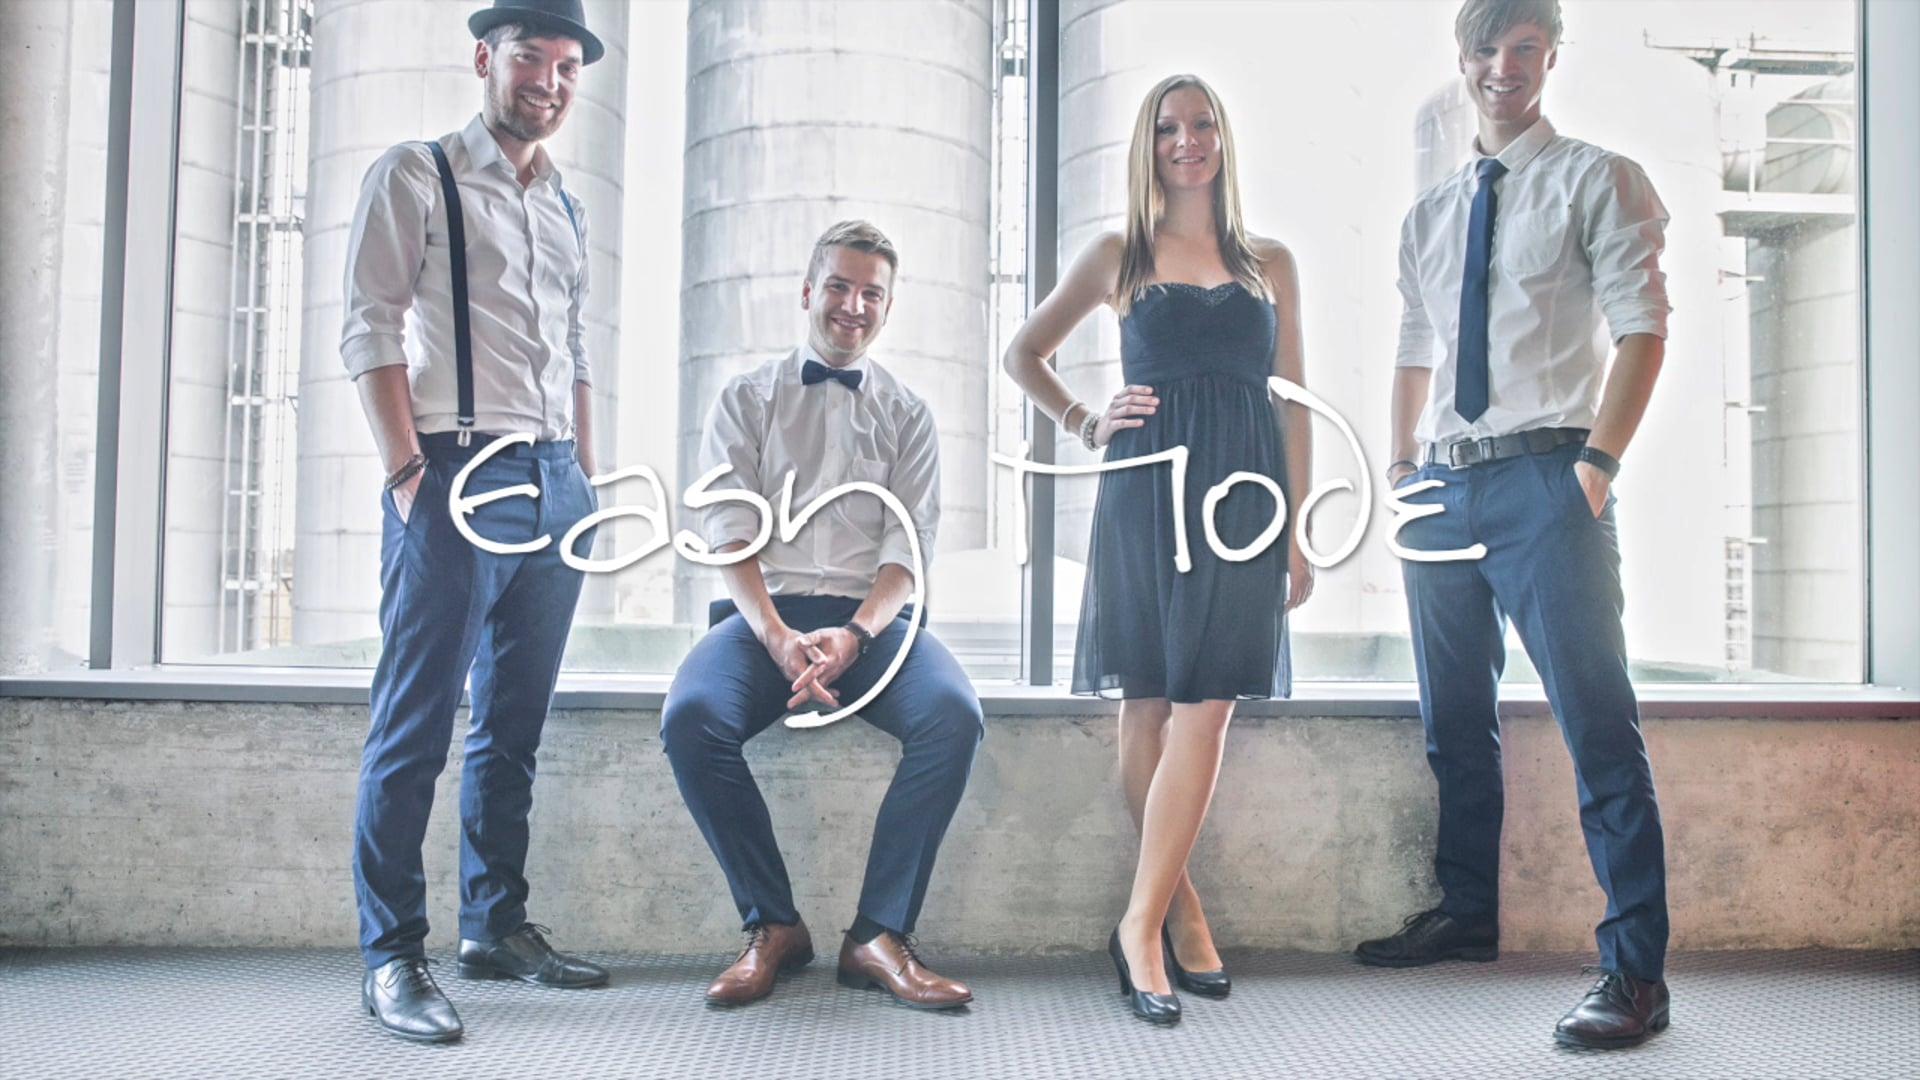 EasyMode-Image